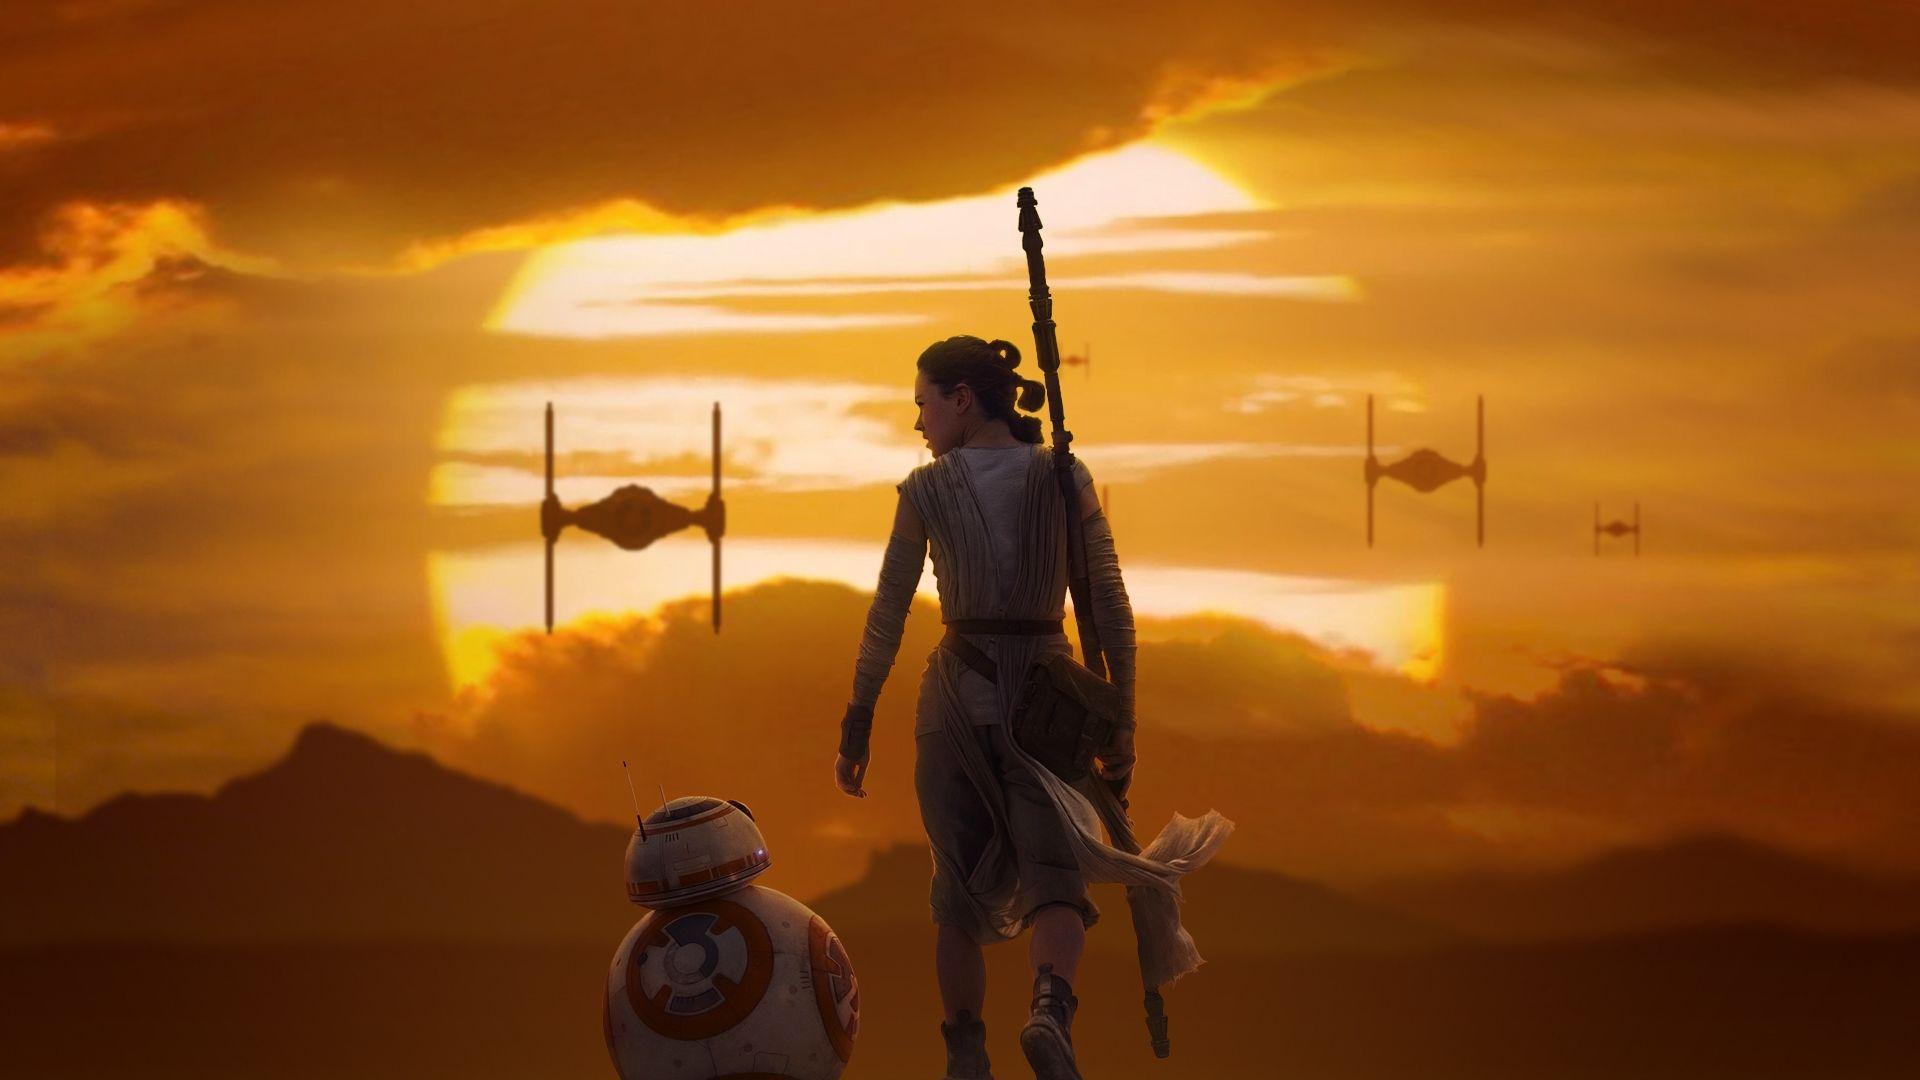 Star Wars The Force Awakens Wallpaper Rey Bb 8 Star Wars The